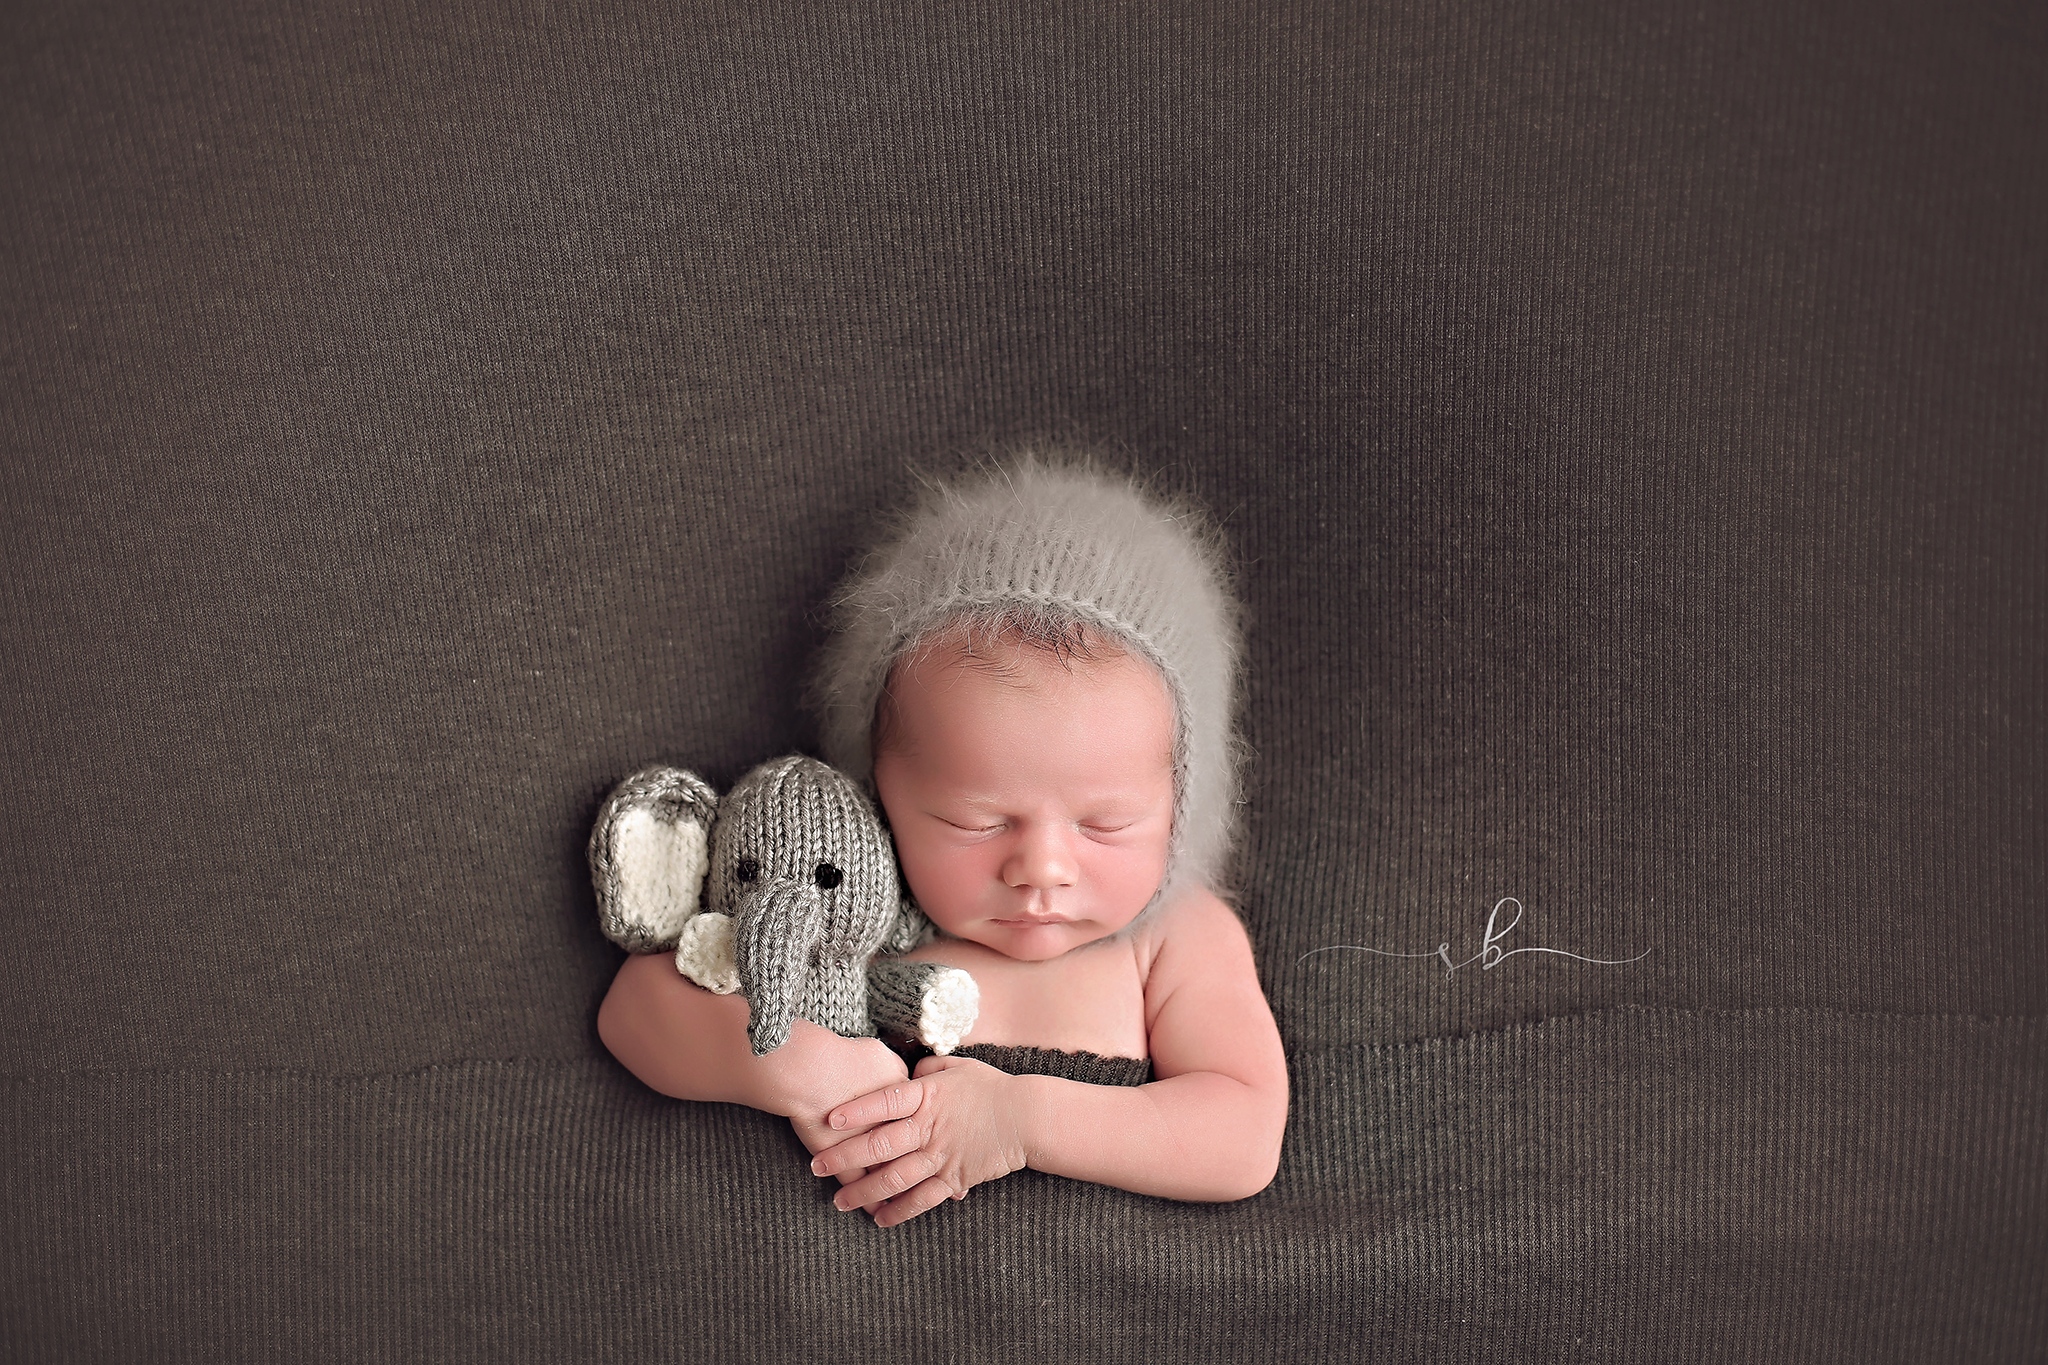 Jack at his newborn session